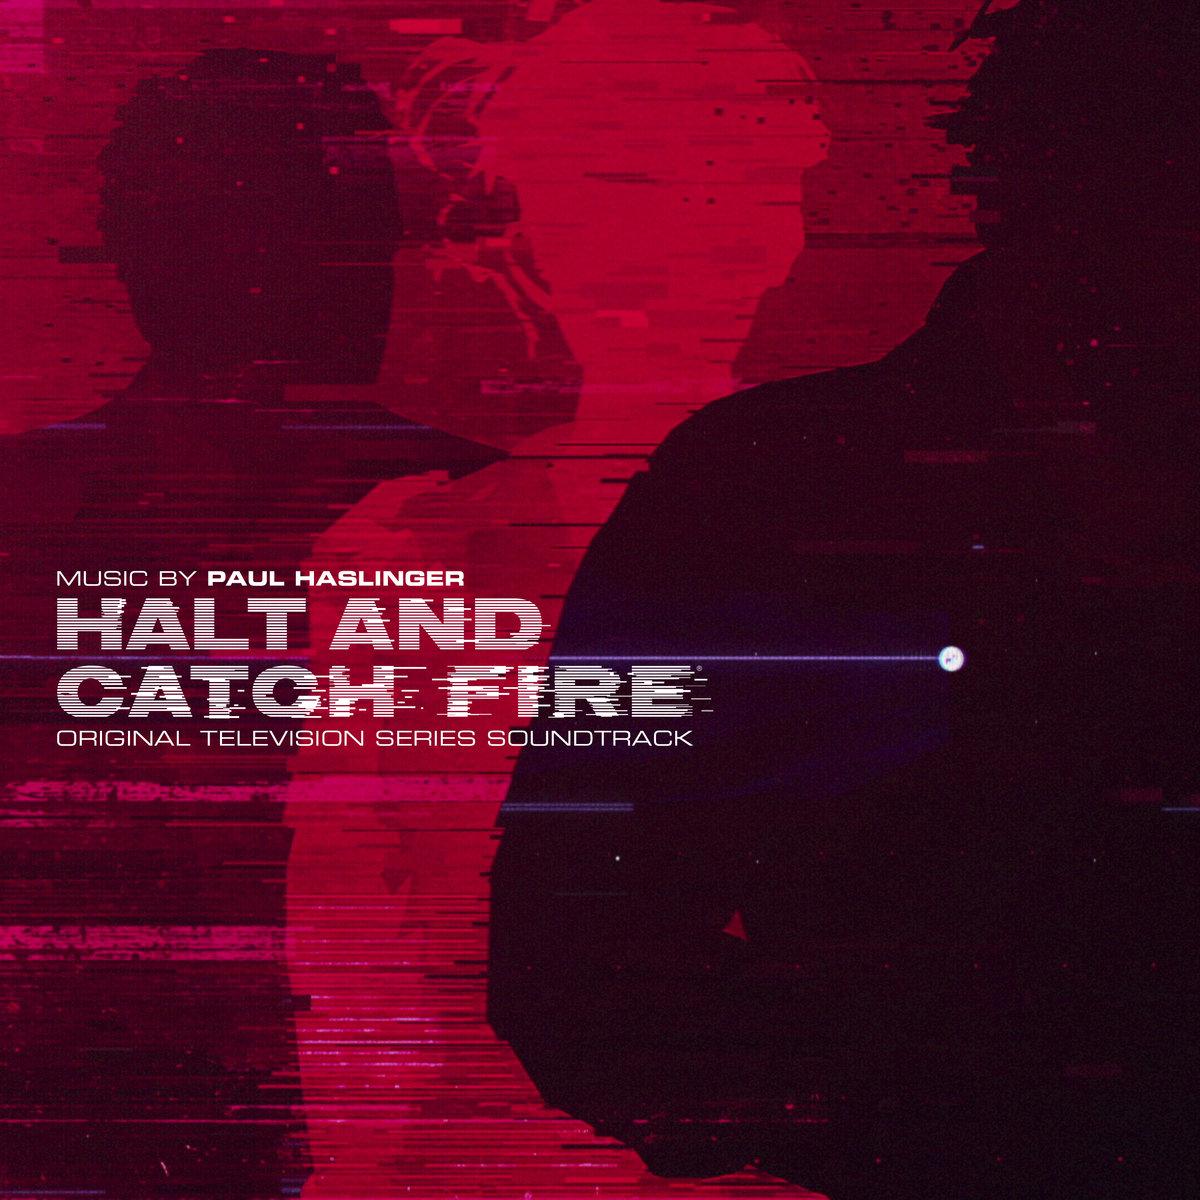 halt and catch fire soundtrack download